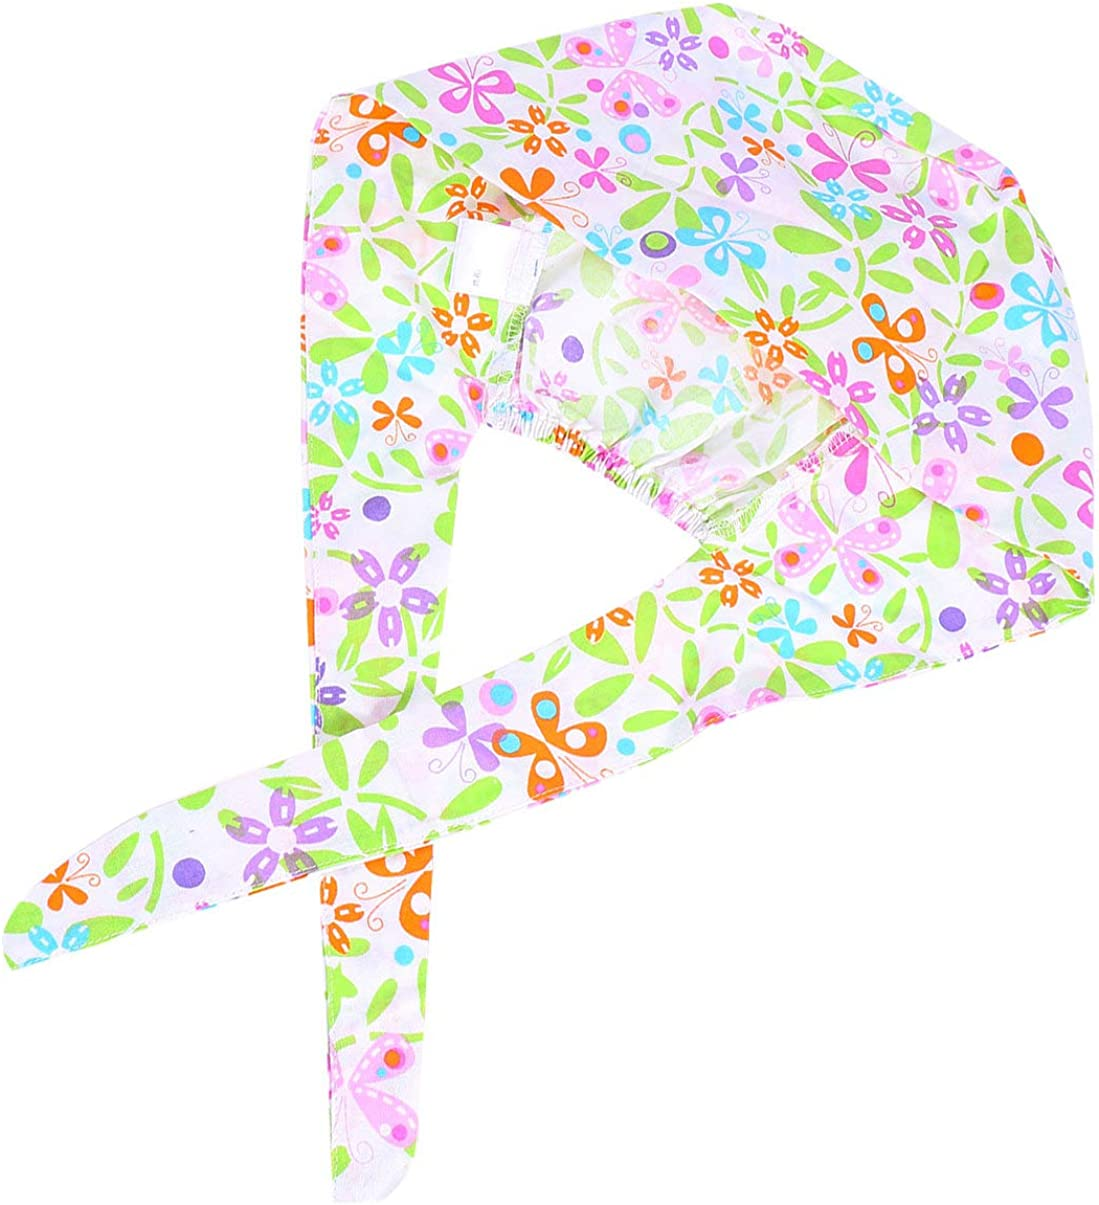 PRETYZOOM Unisex Scrub Cap Peeling Kappe OP Haube verstellbar Chirurgische Kappe Chemo Bouffant Cap Baumwolle Krankenschwester M/ütze Medical Cap f/ür Arzt Zahnarzt Koch Blumen